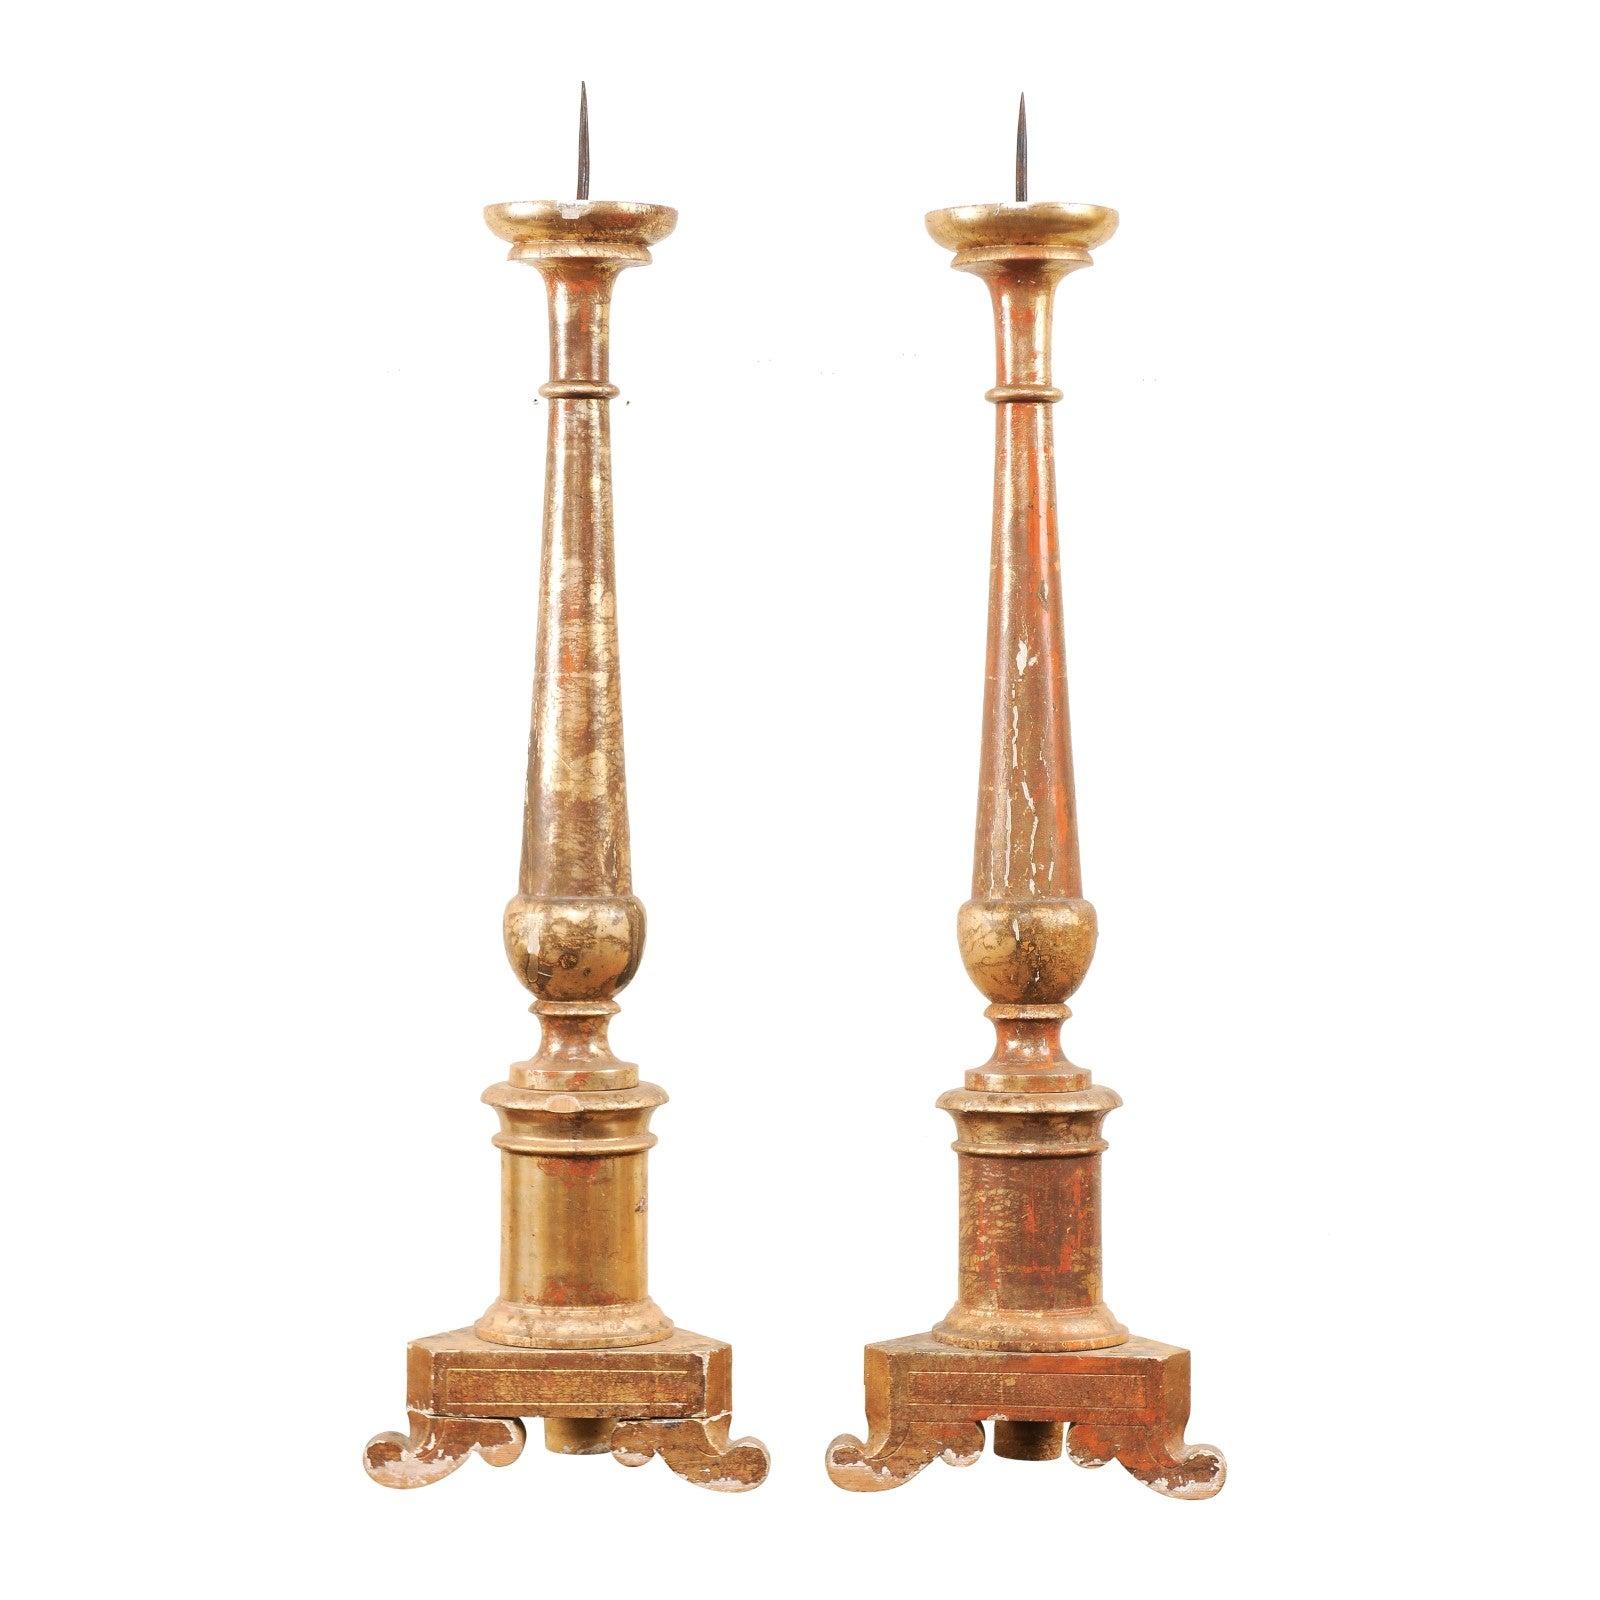 Pair of Italian 19th Century Altar Sticks/Tall Gilded Candlesticks